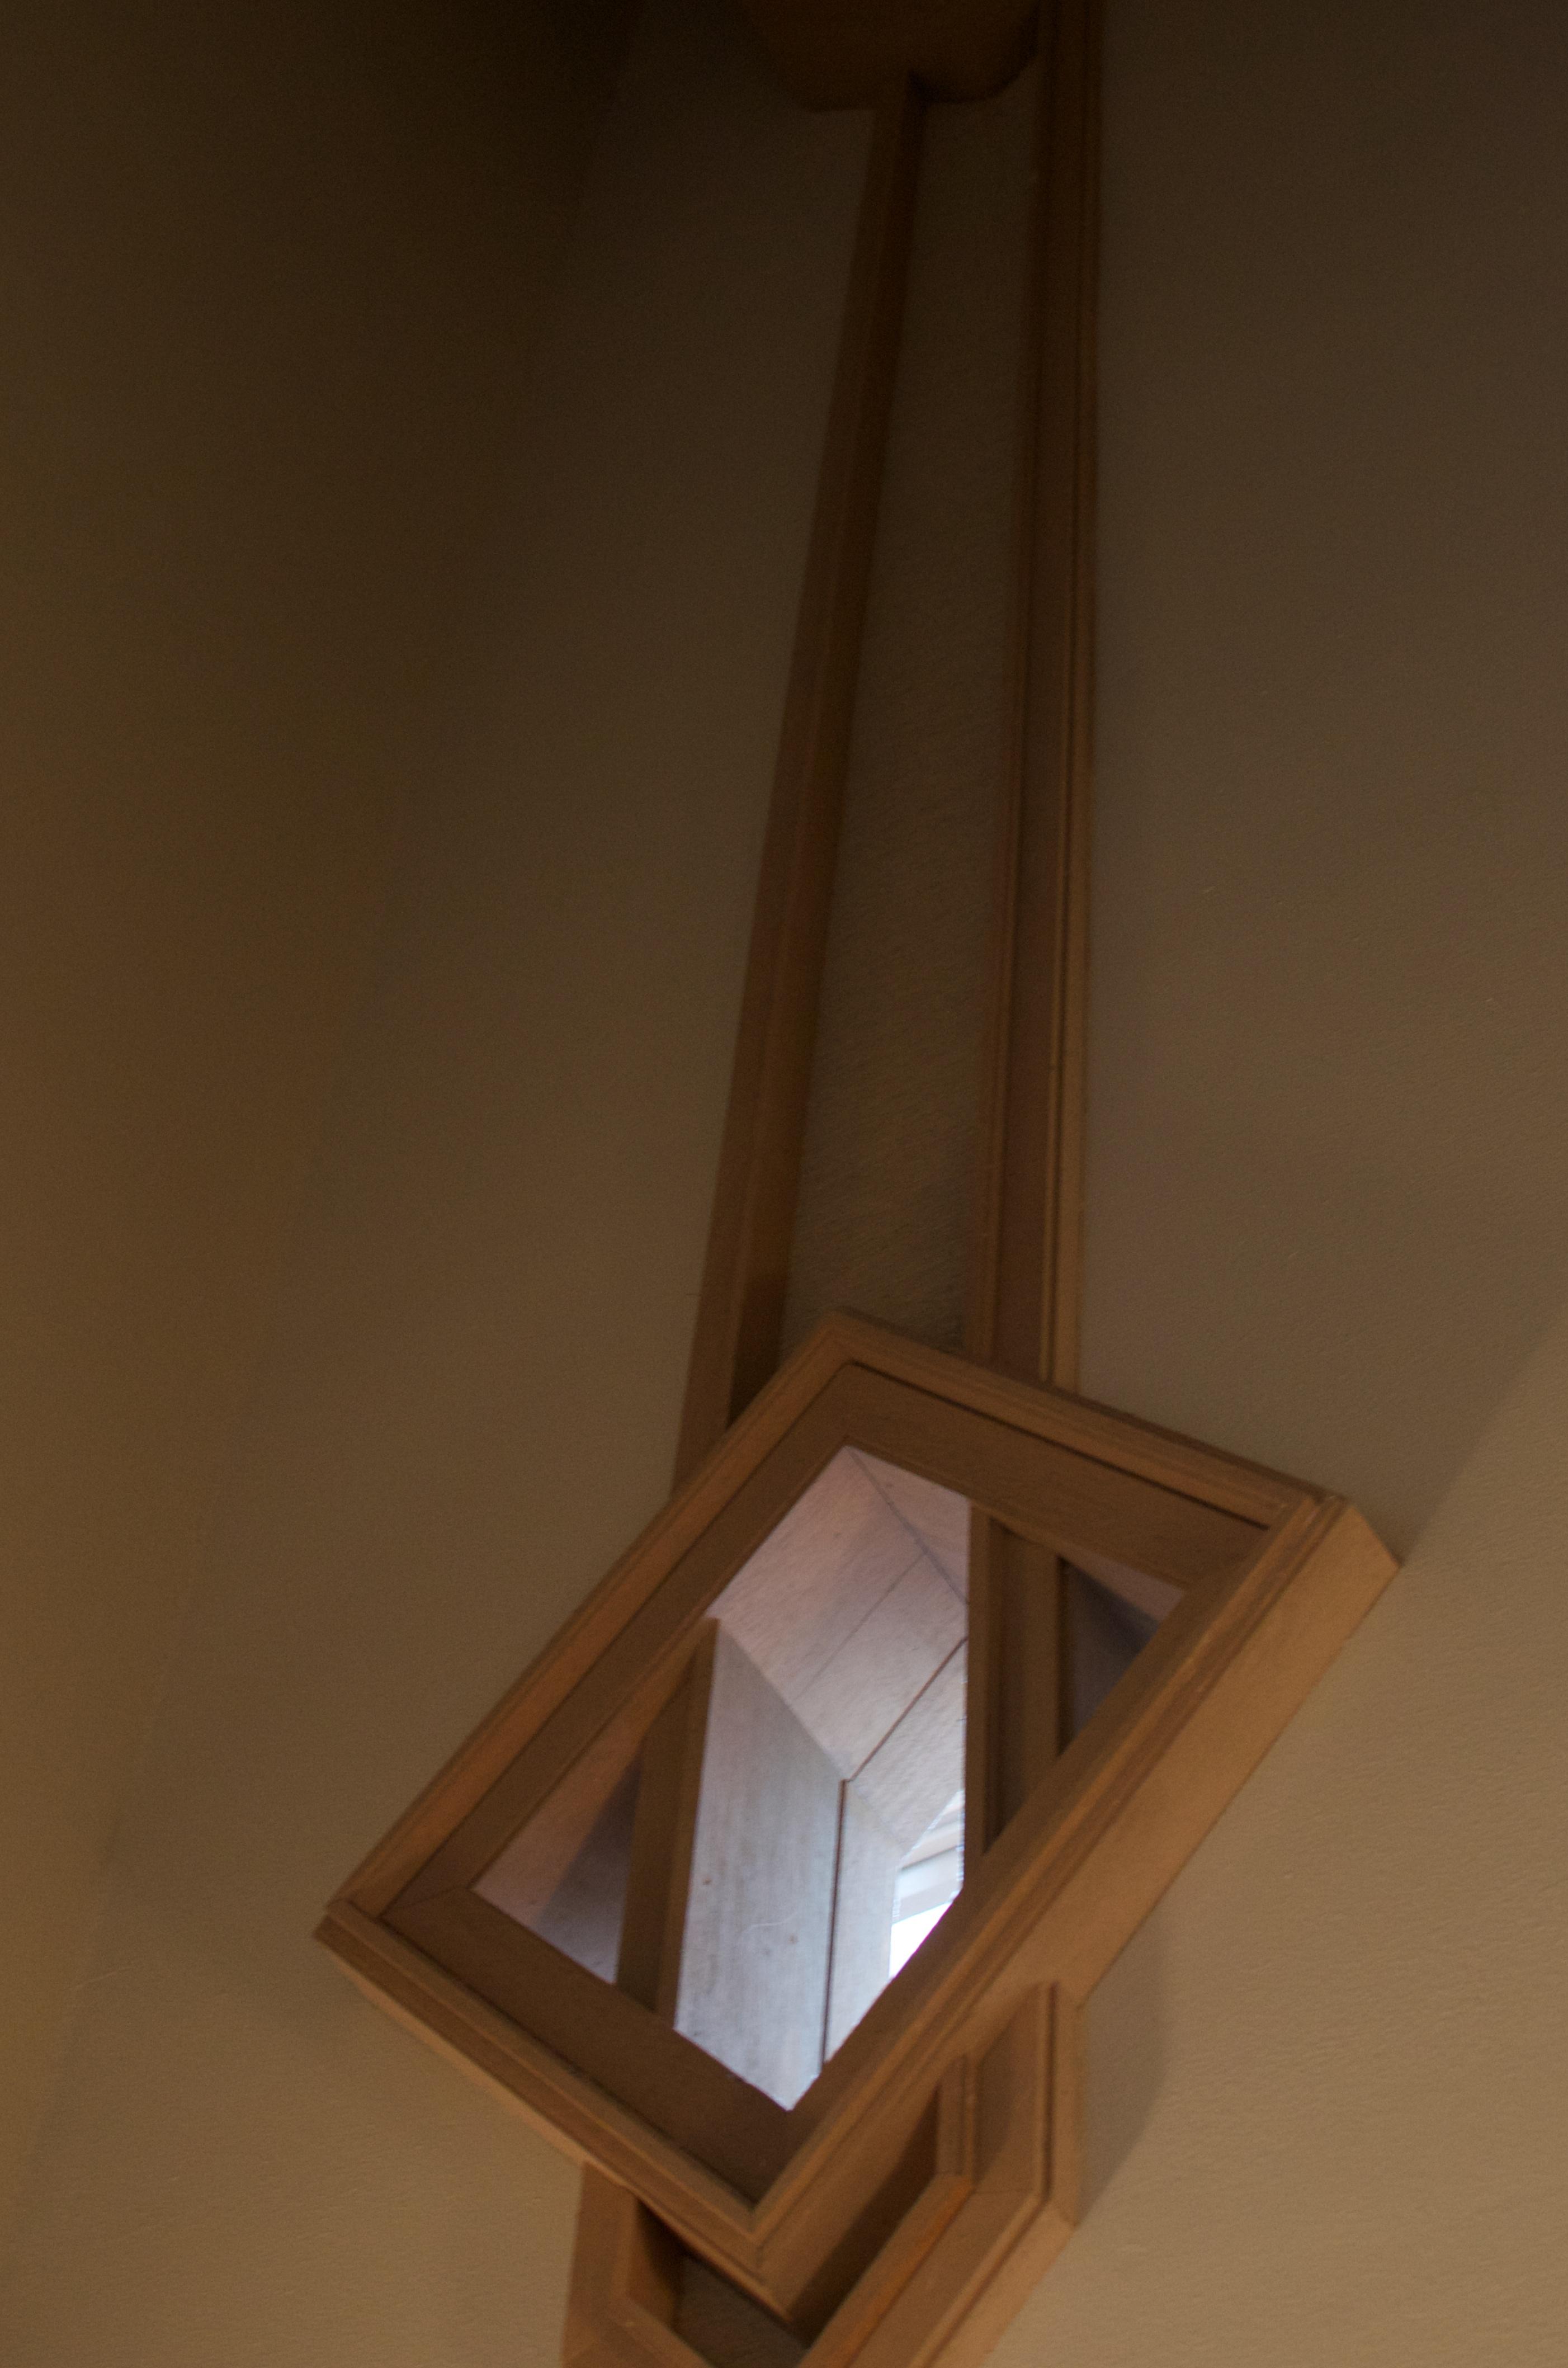 High Quality File:Marty Leonard Community Chapel, Internal Lighting Detail